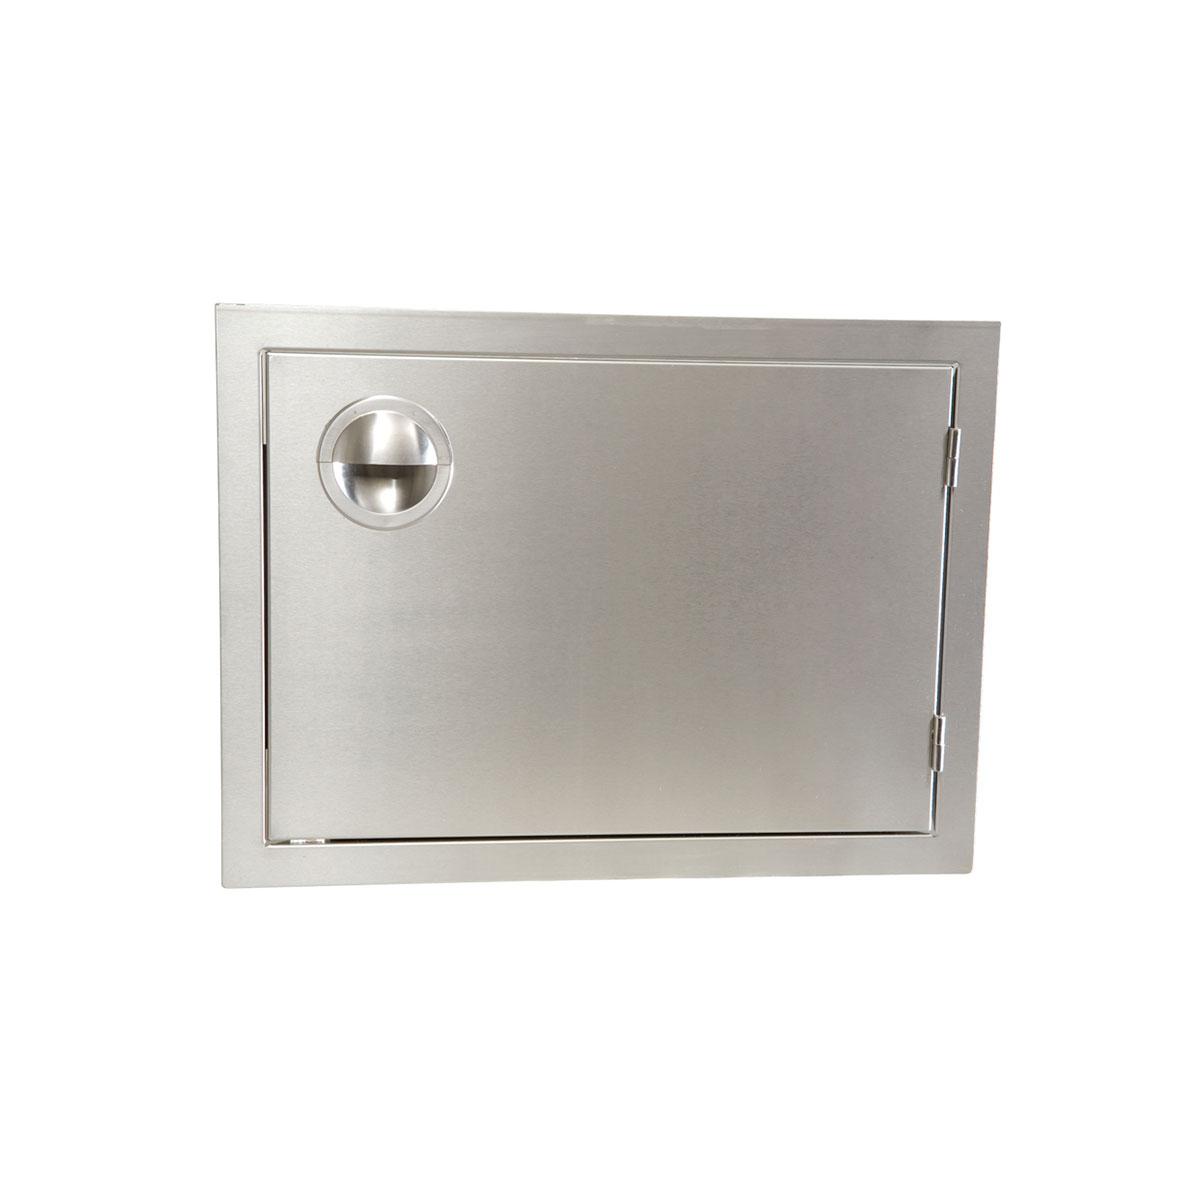 Luxor Aht Adb 1724h Slimline 24 Quot Horizontal Single Door